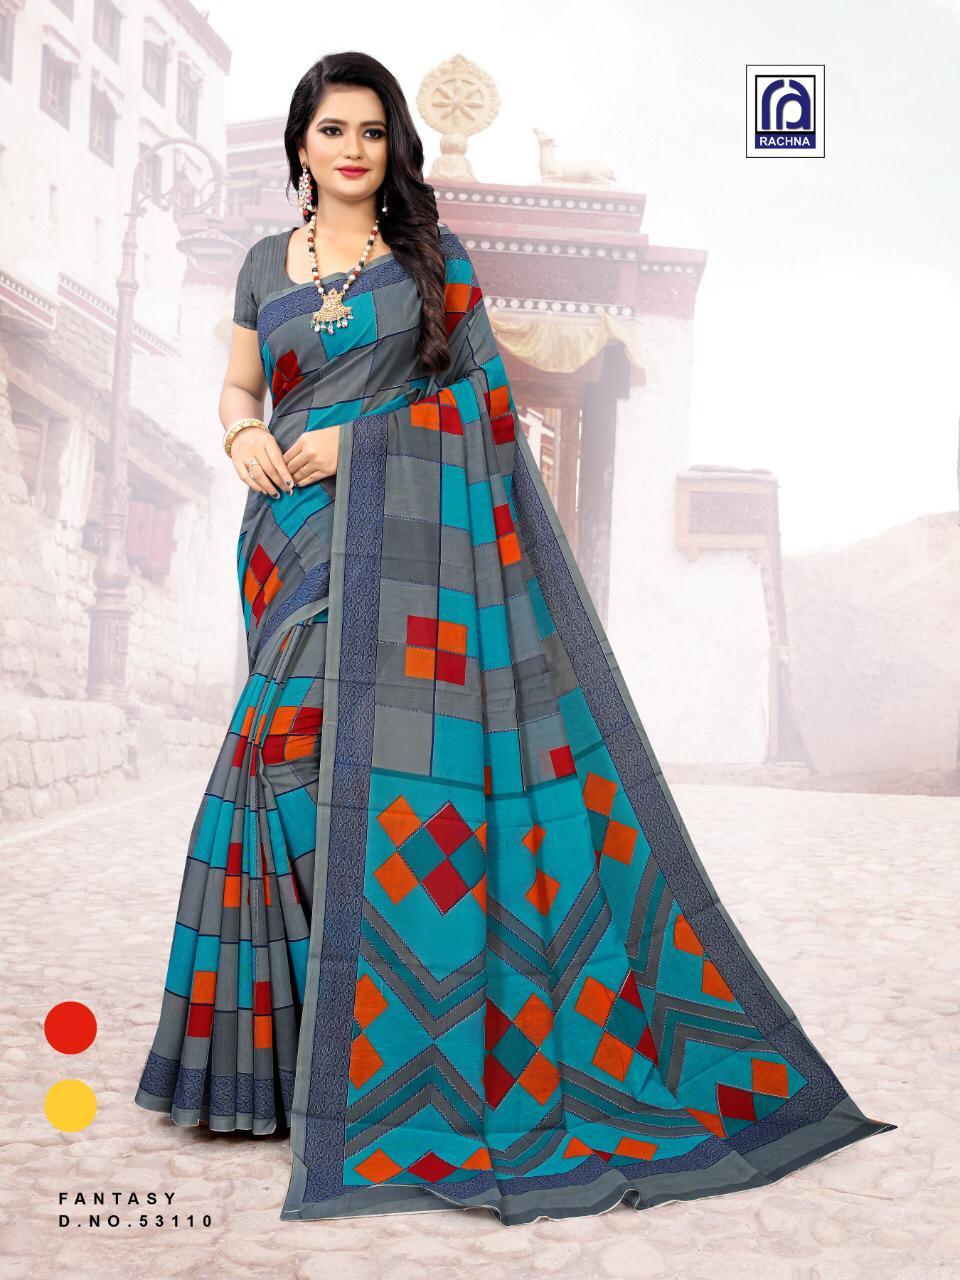 Rachna Launch Fantacy Cotton 53101-53115 Series Saree At Chepest Price